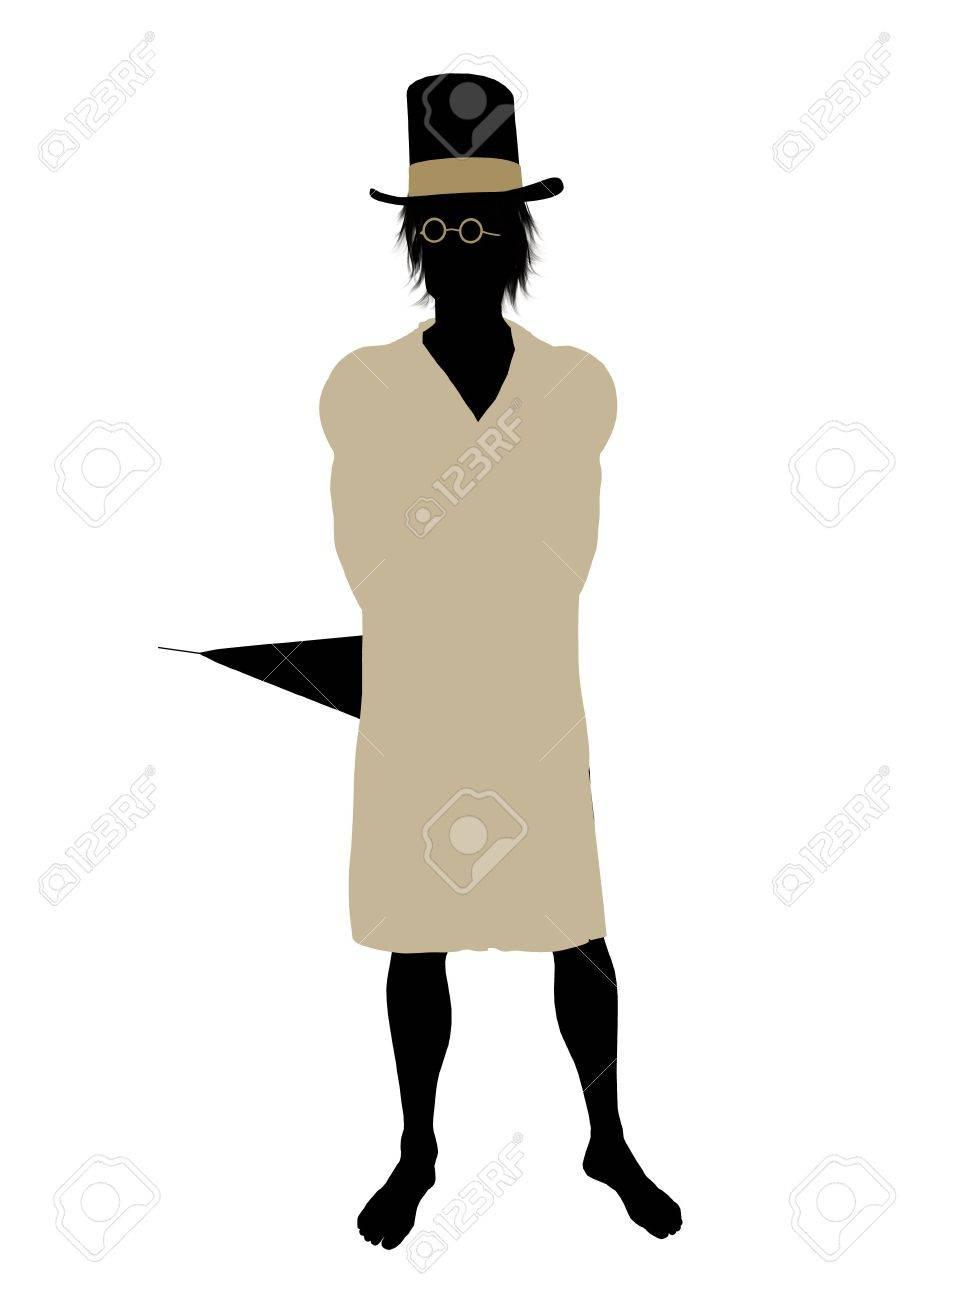 John of Peter Pan illustration silhouette on a white background Stock Illustration - 6586149